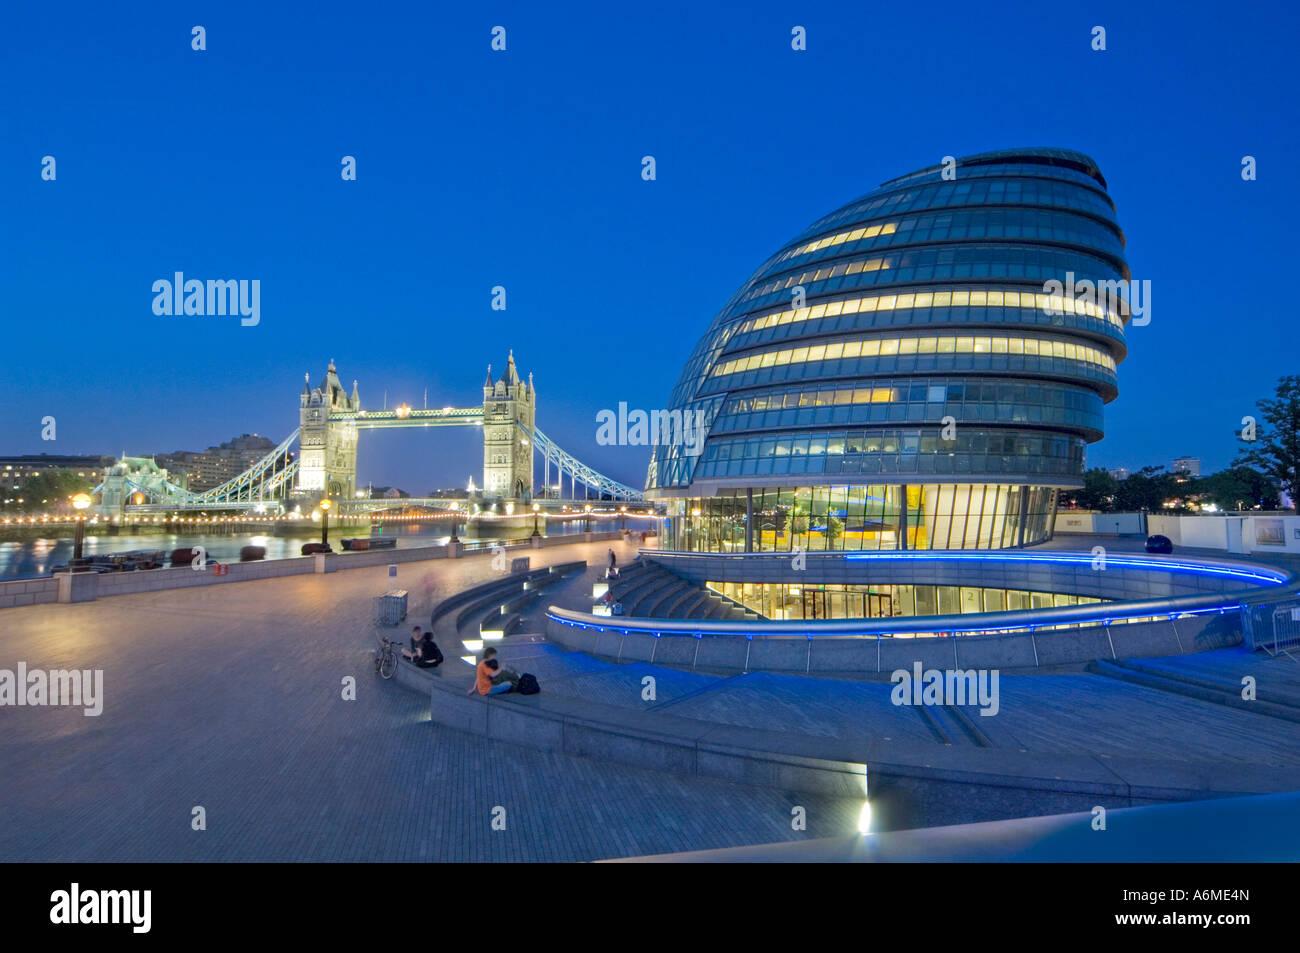 mayor of london modern building london england uk - Stock Image